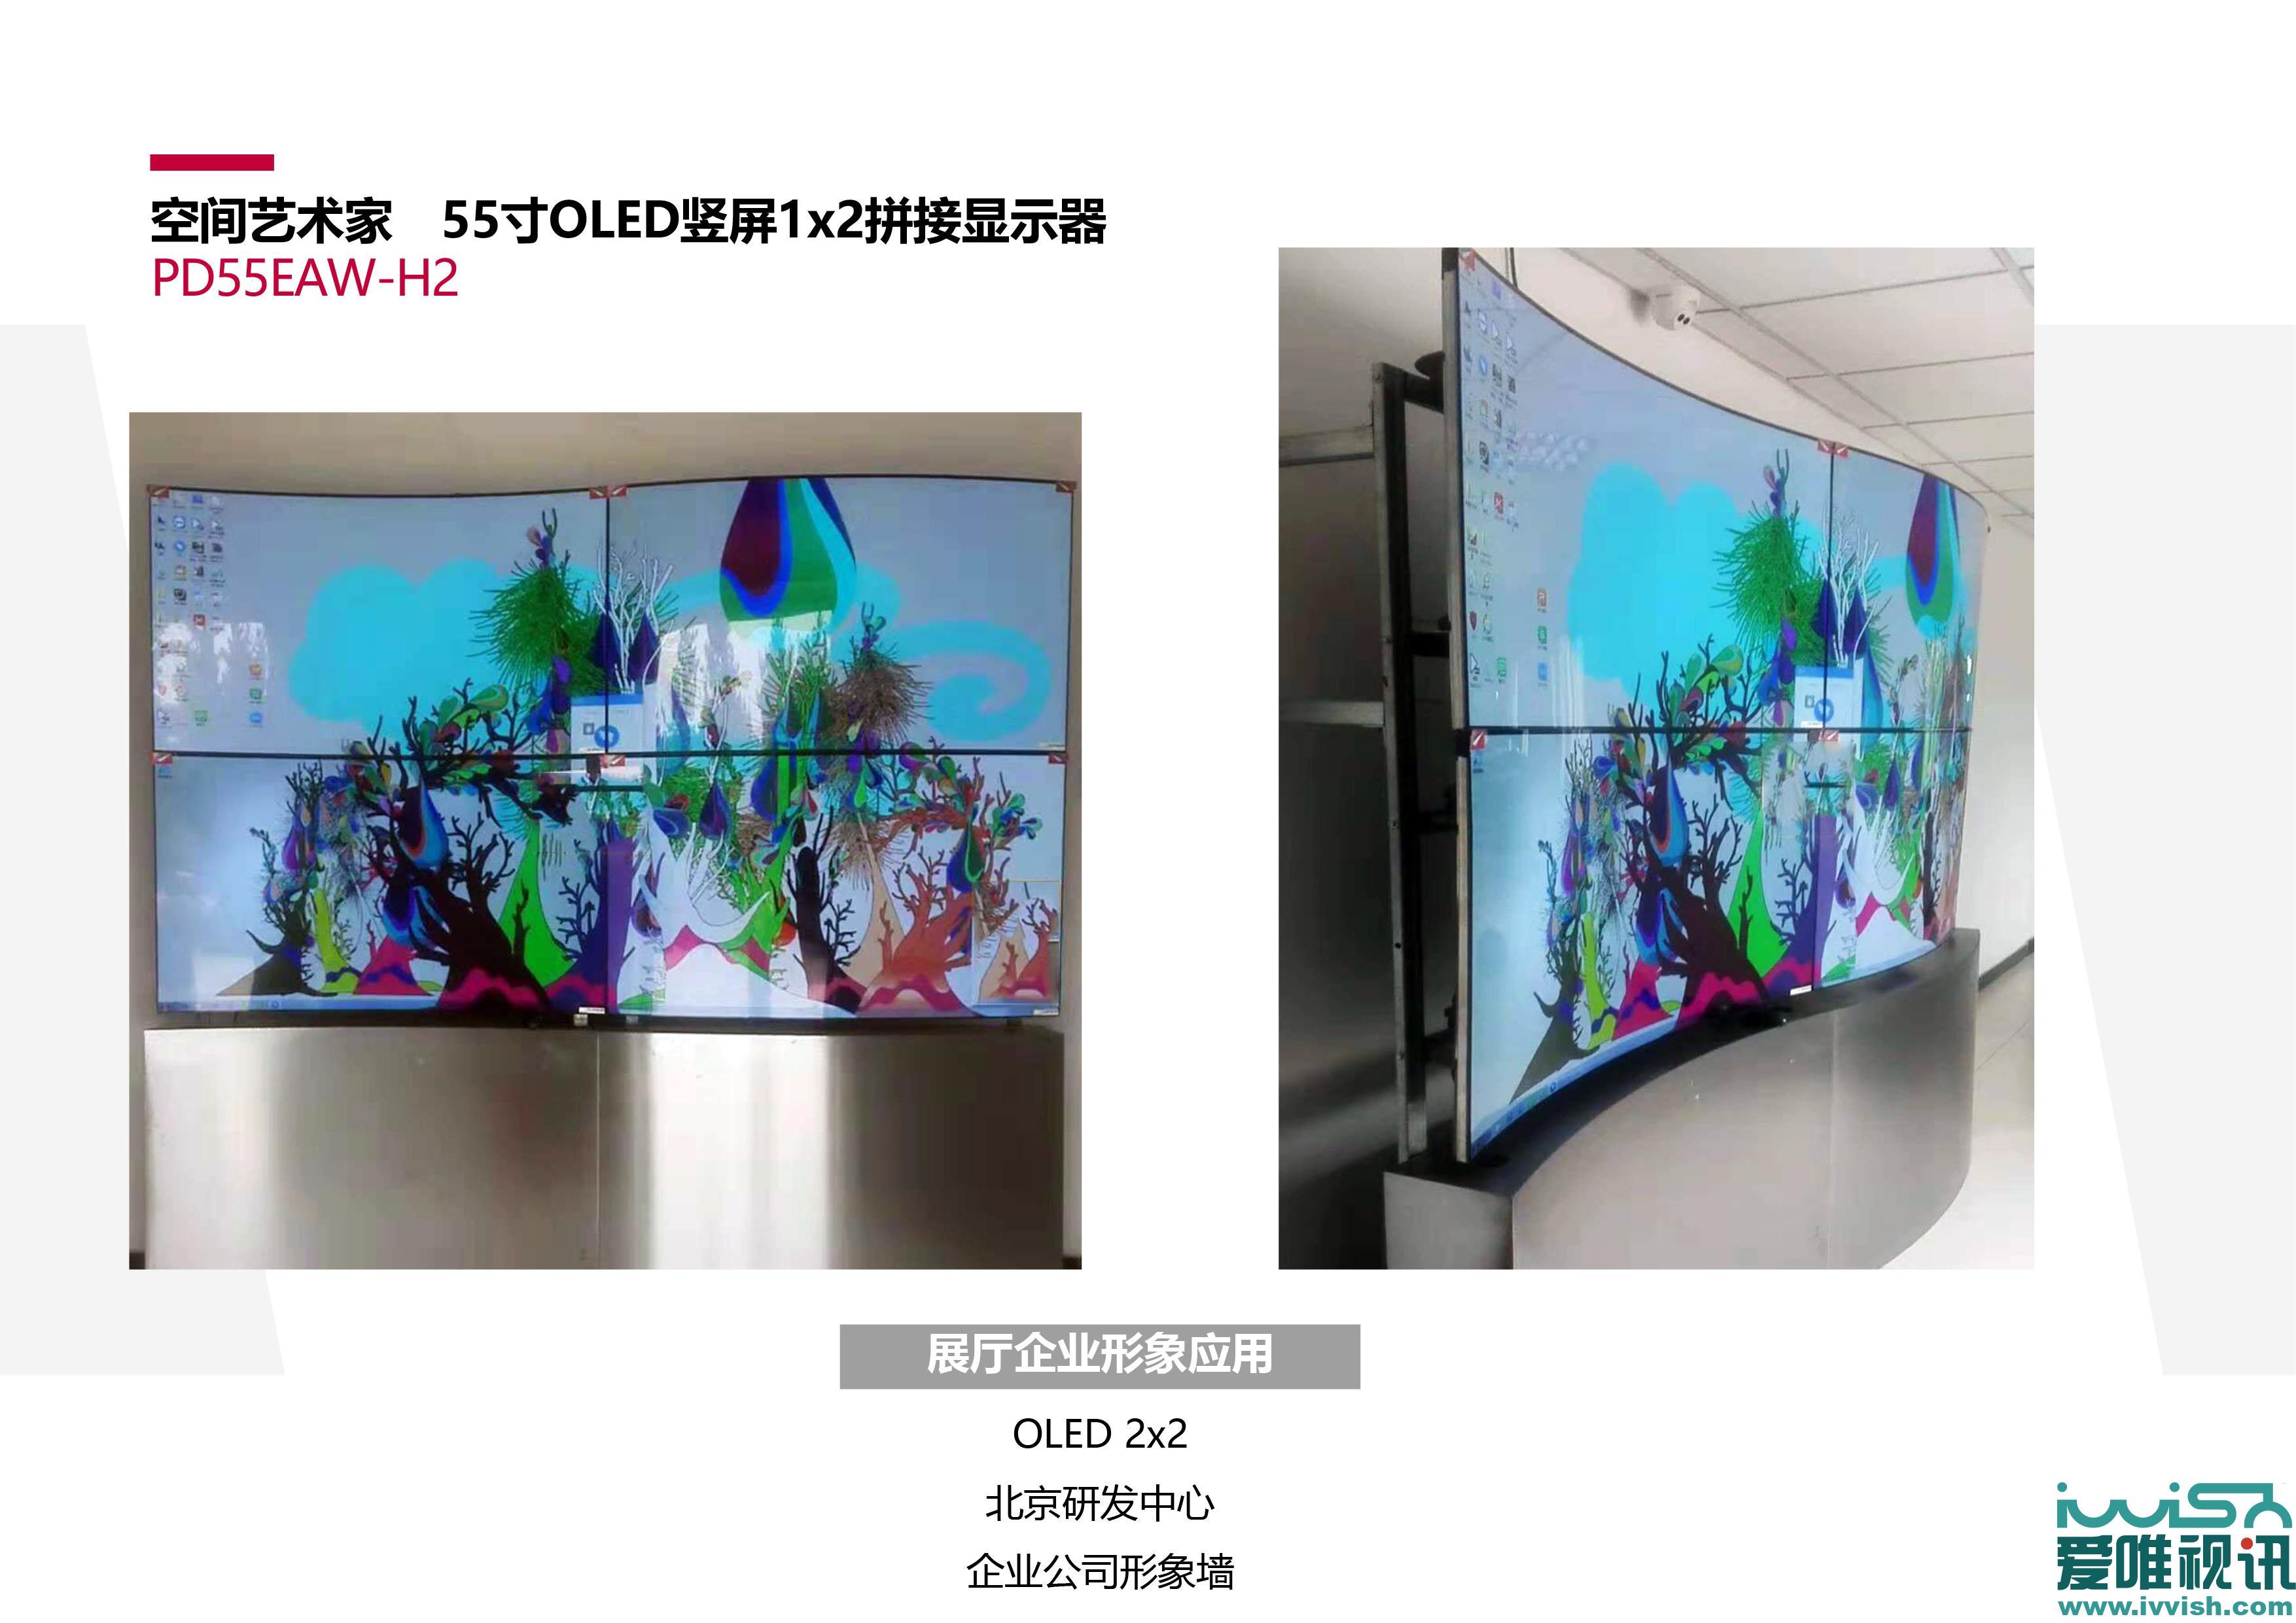 OLED竖屏1x2拼接显示器